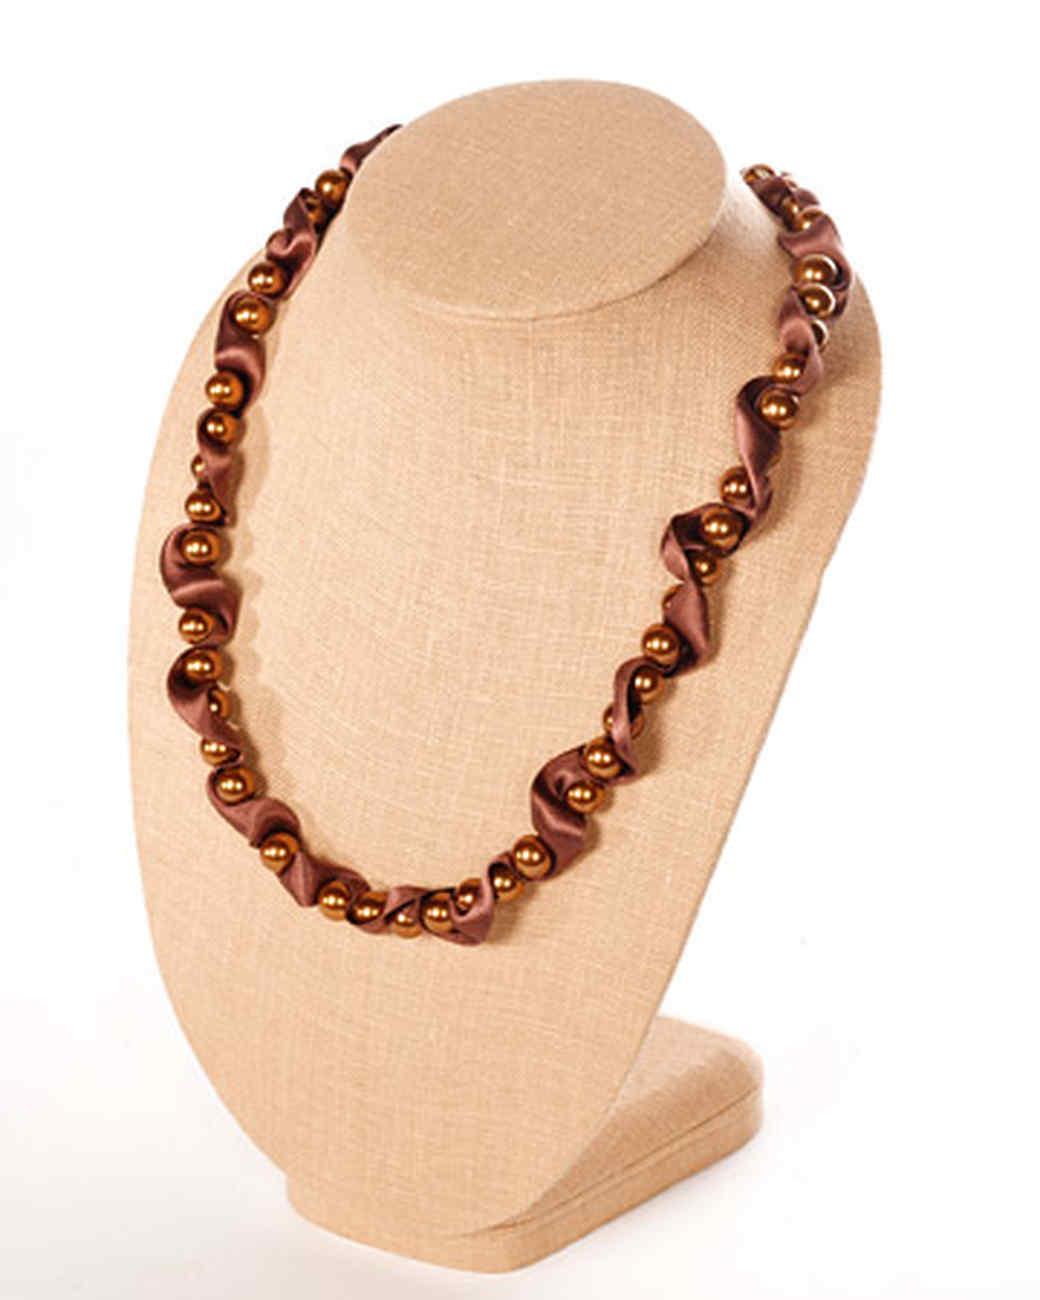 3145_032708_necklace.jpg